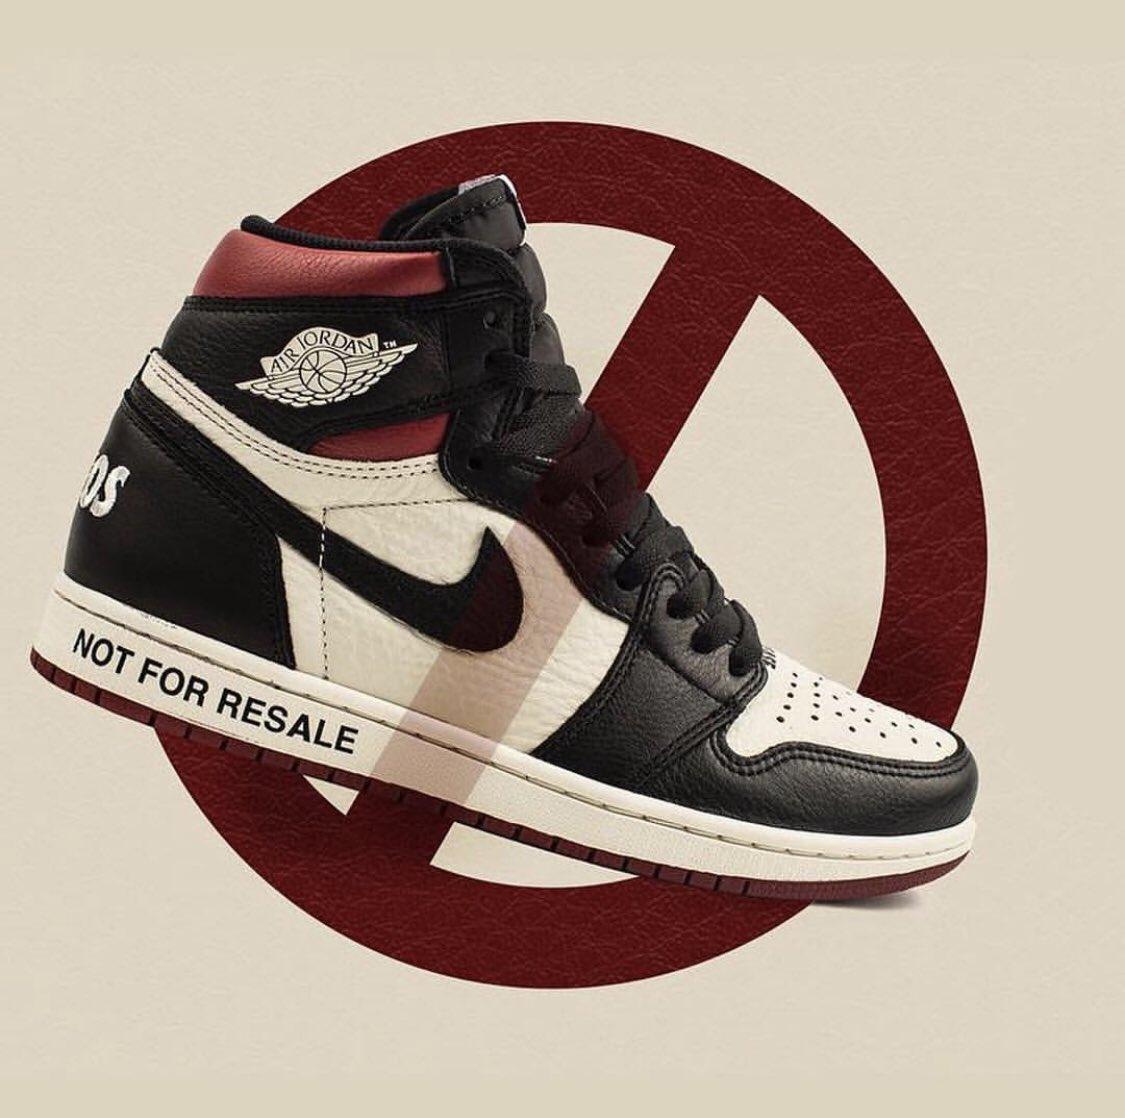 4385b0014 Jordan Retro 1  Not For Resale  online raffle open via Kickz Premium Global  shipping https   bit.ly 2Lg9LYa  snkr twitrpic.twitter.com xltHu8QDC6